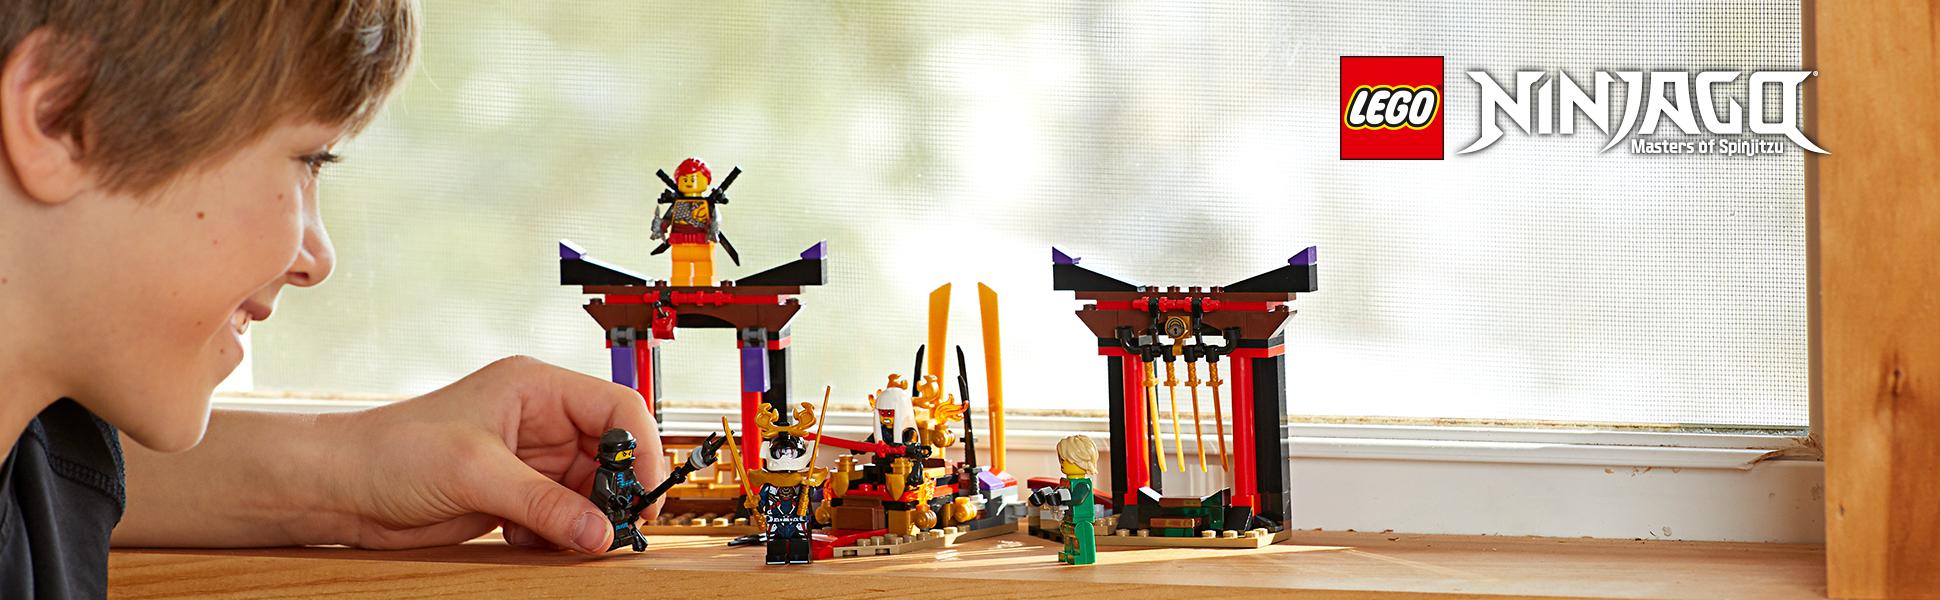 Kind spielt mit LEGO® NINJAGO Figuren